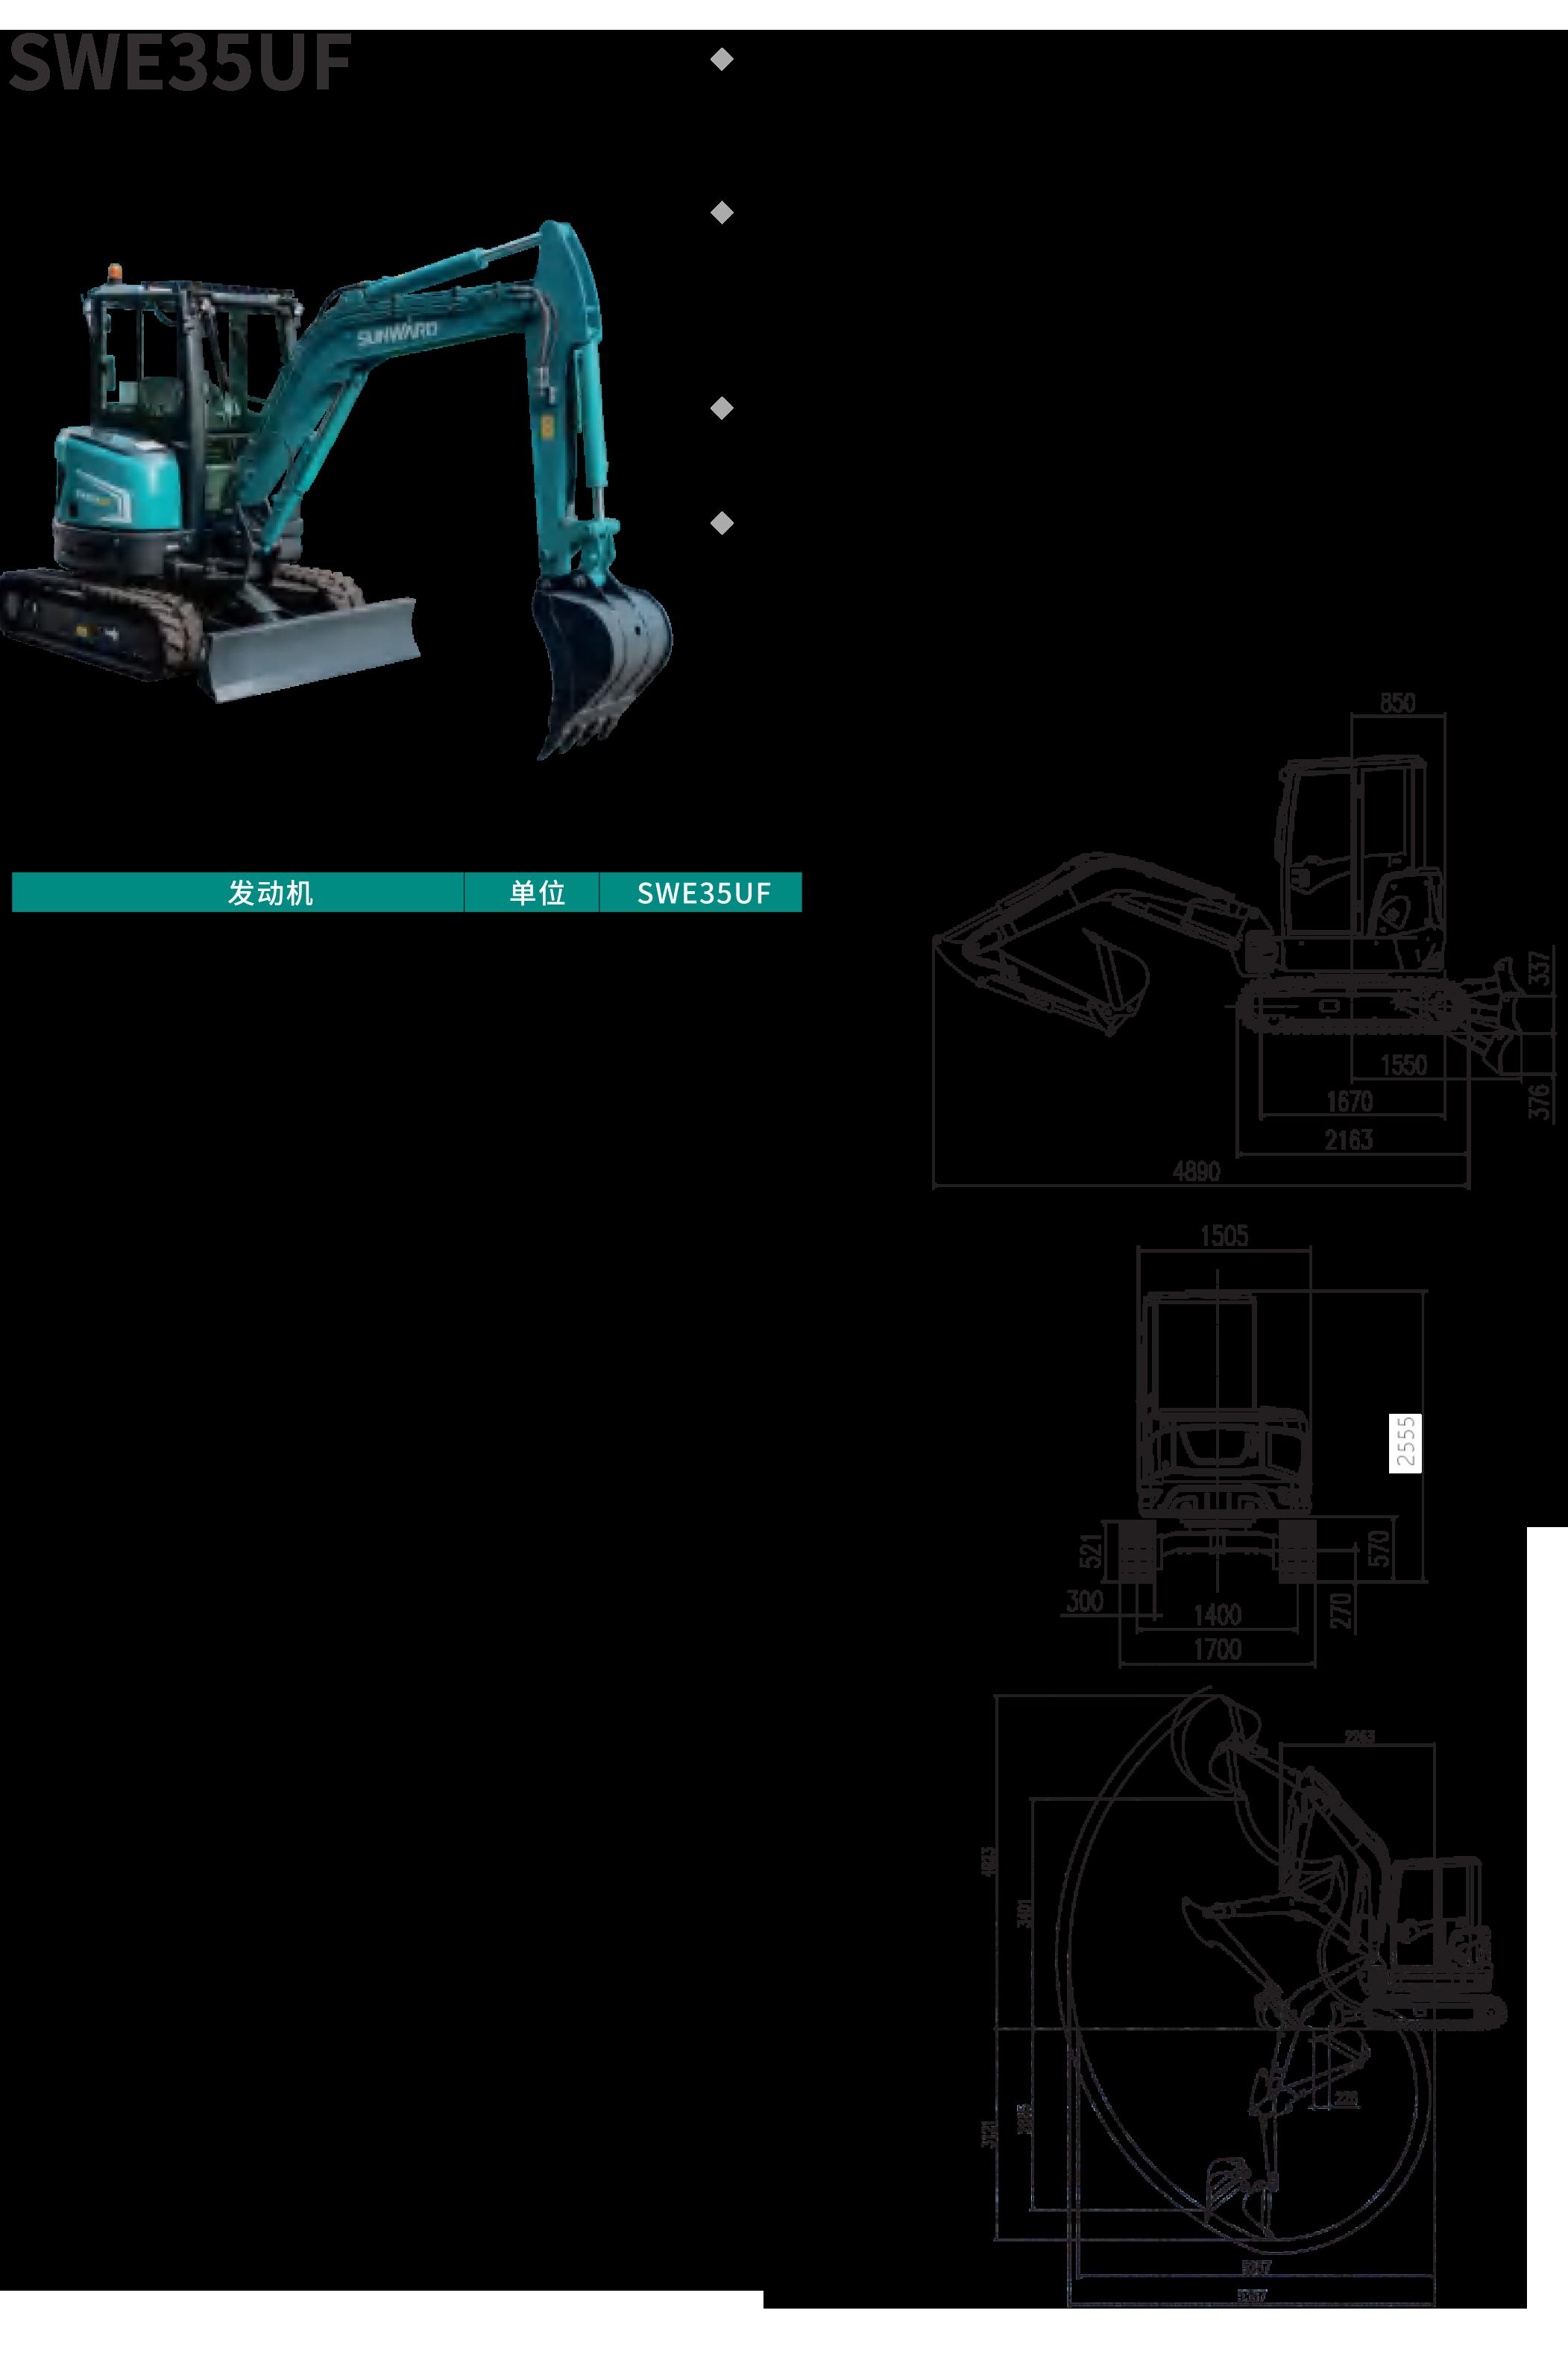 SWE35UF 微型挖掘机